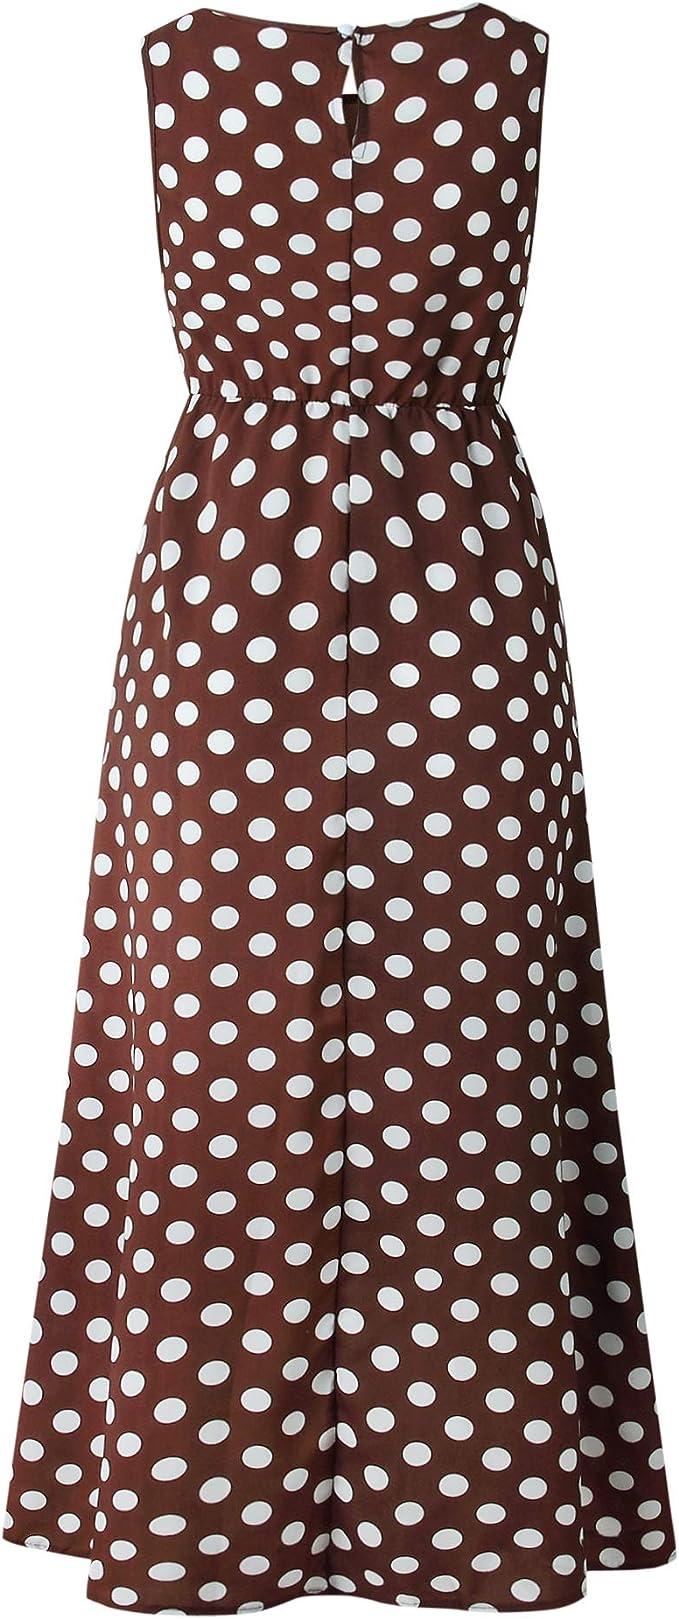 80s Costumes, 80s Clothing Ideas- Girls YHBAO Womens Vintage Polka Dot Printing Sleeveless Long Dress Evening Party Sexy Dress  AT vintagedancer.com